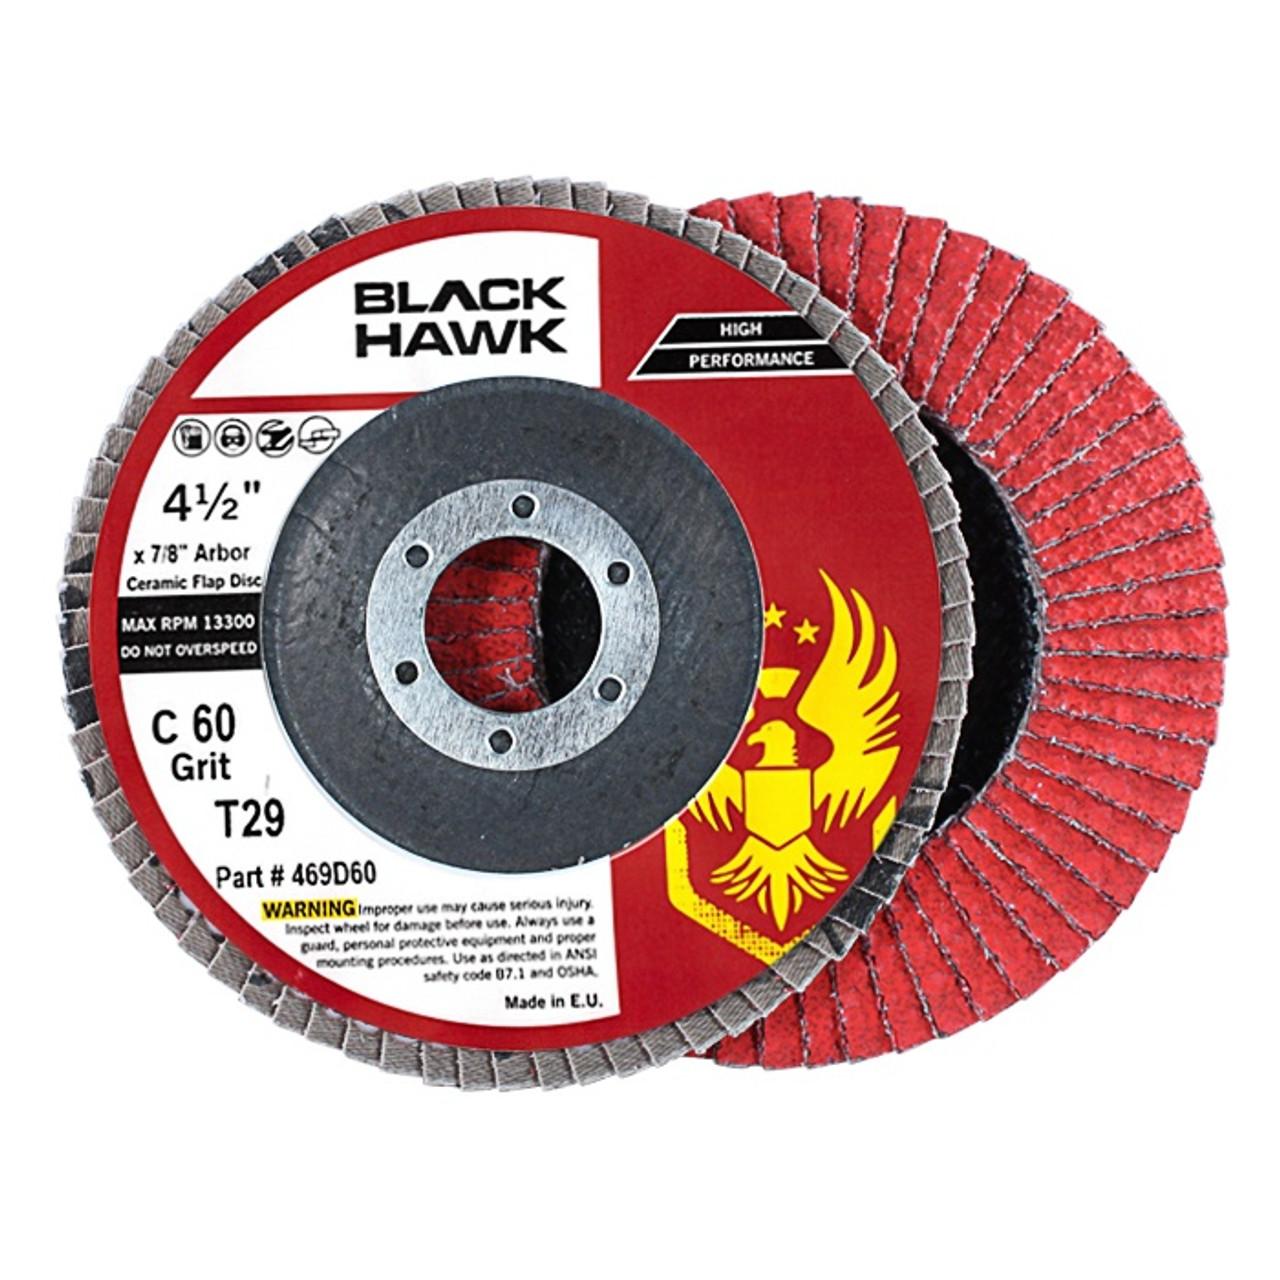 "10 Pack 4.5/"" x 7//8/"" Black Hawk 40 Grit Zirconia Flap Disc Grinding Wheels T29"